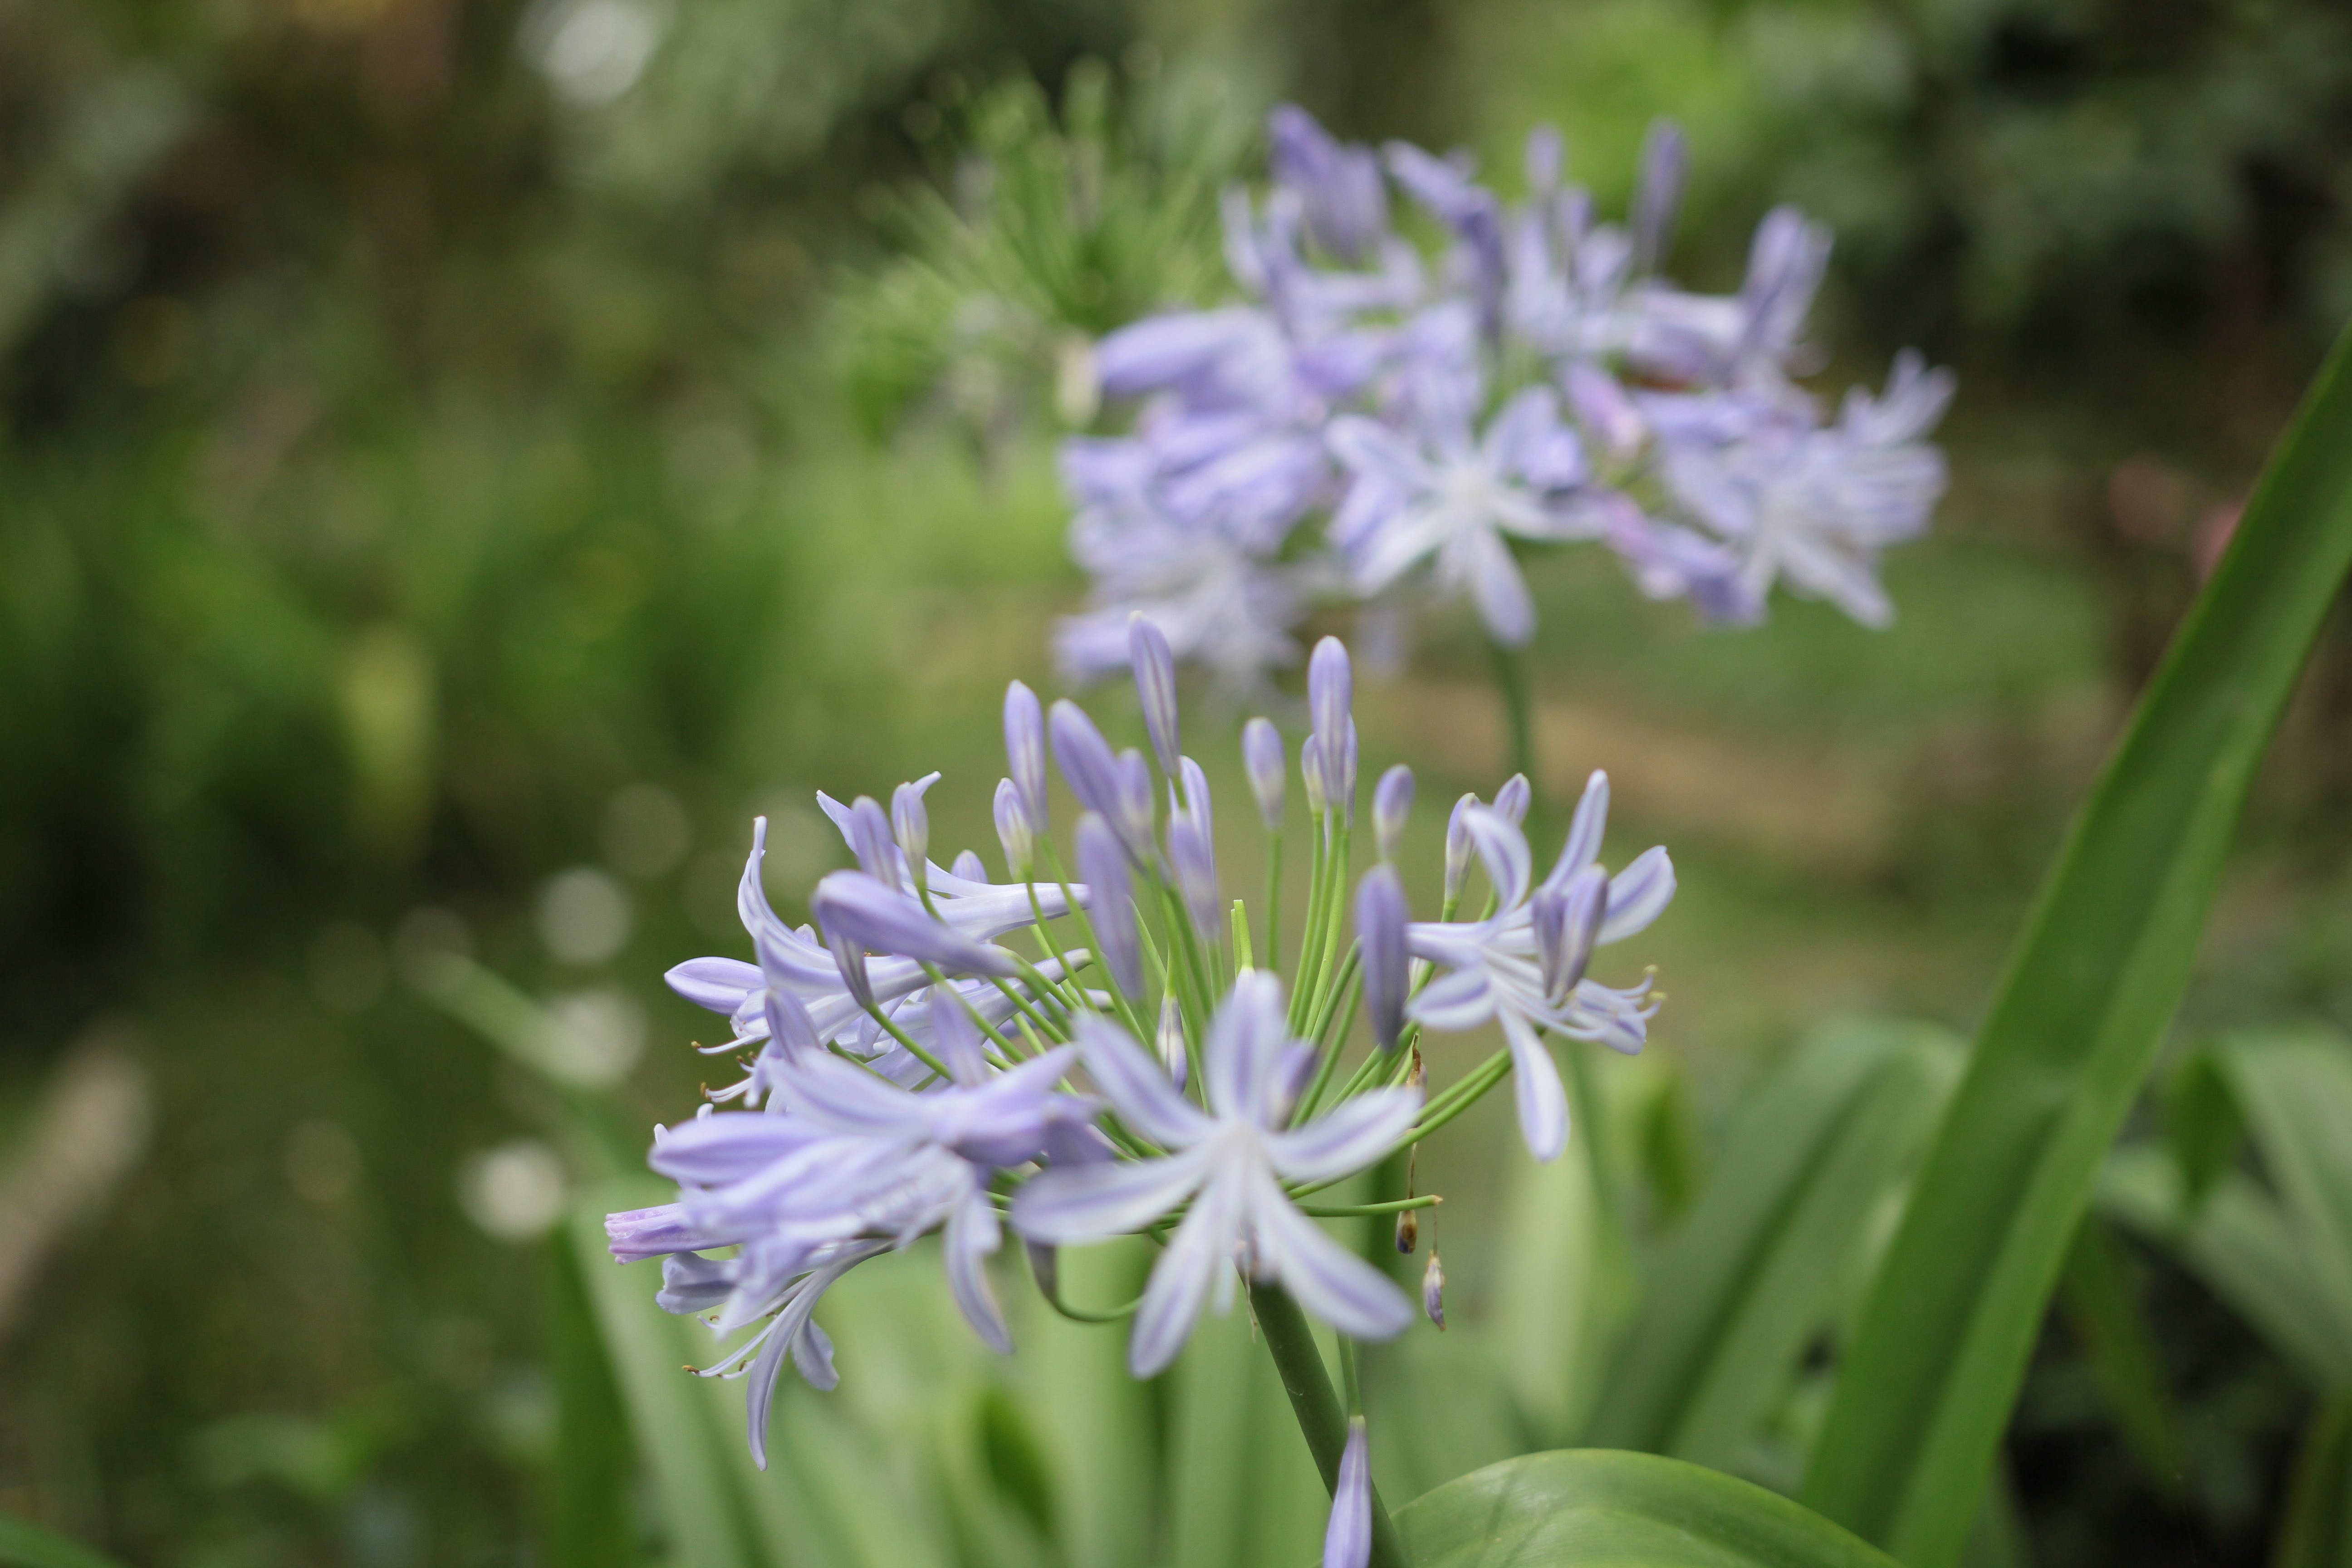 Purple Petaled Flower Selective Focus Photography